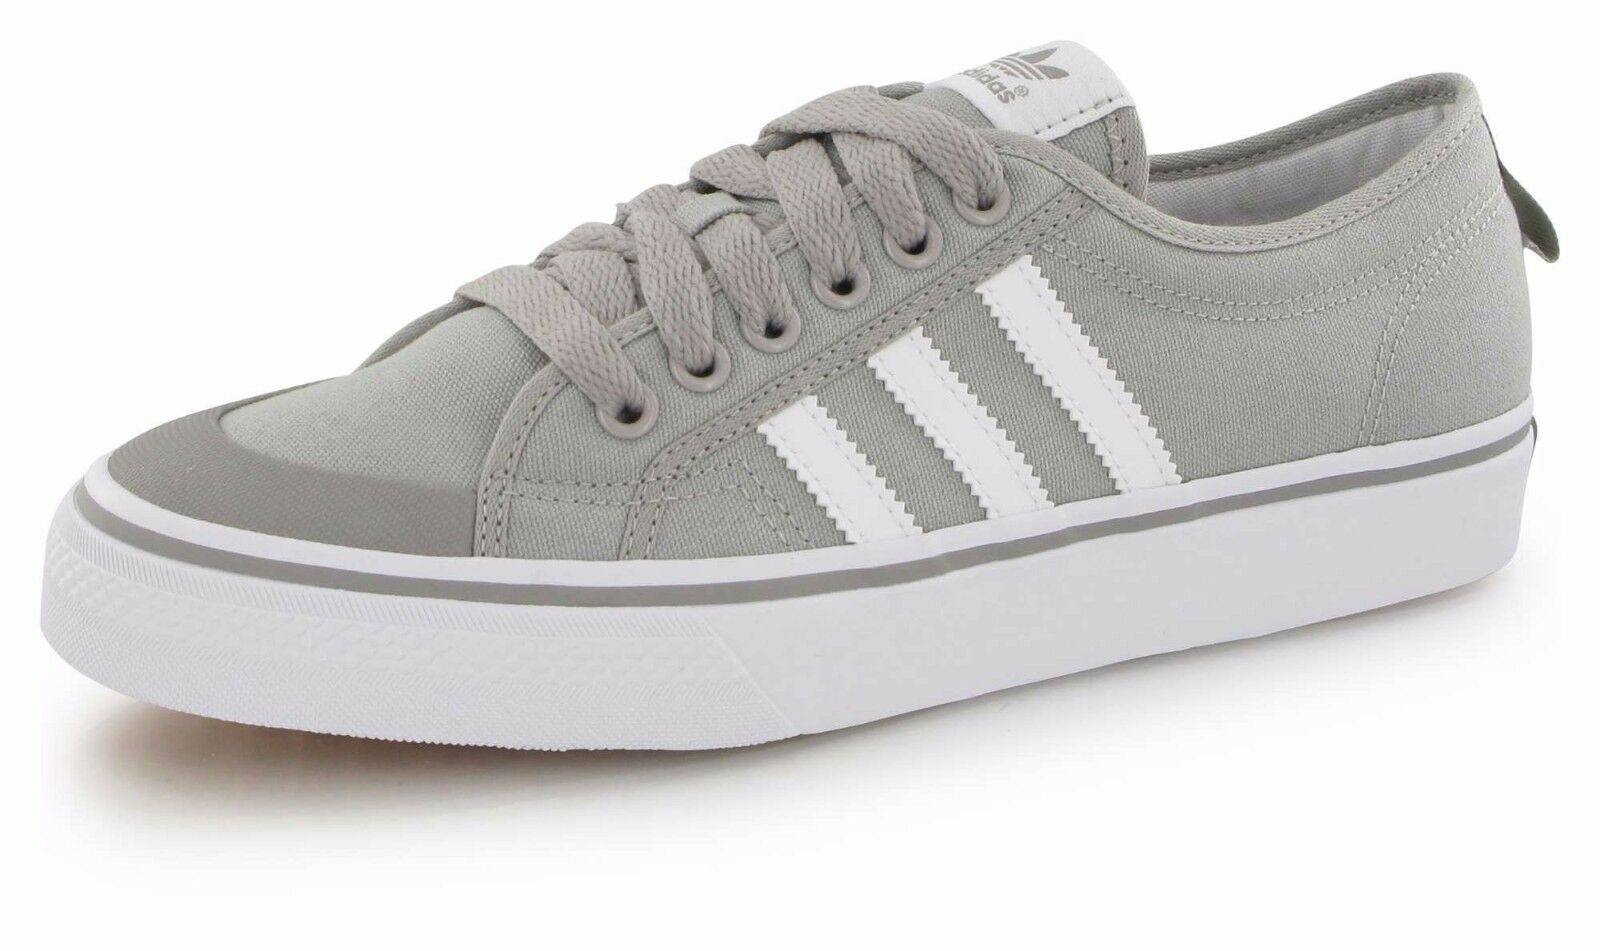 Adidas Hombre's Originals Nizza Low Hombre's Adidas Daily Sports Zapatos B35145 89cf1c